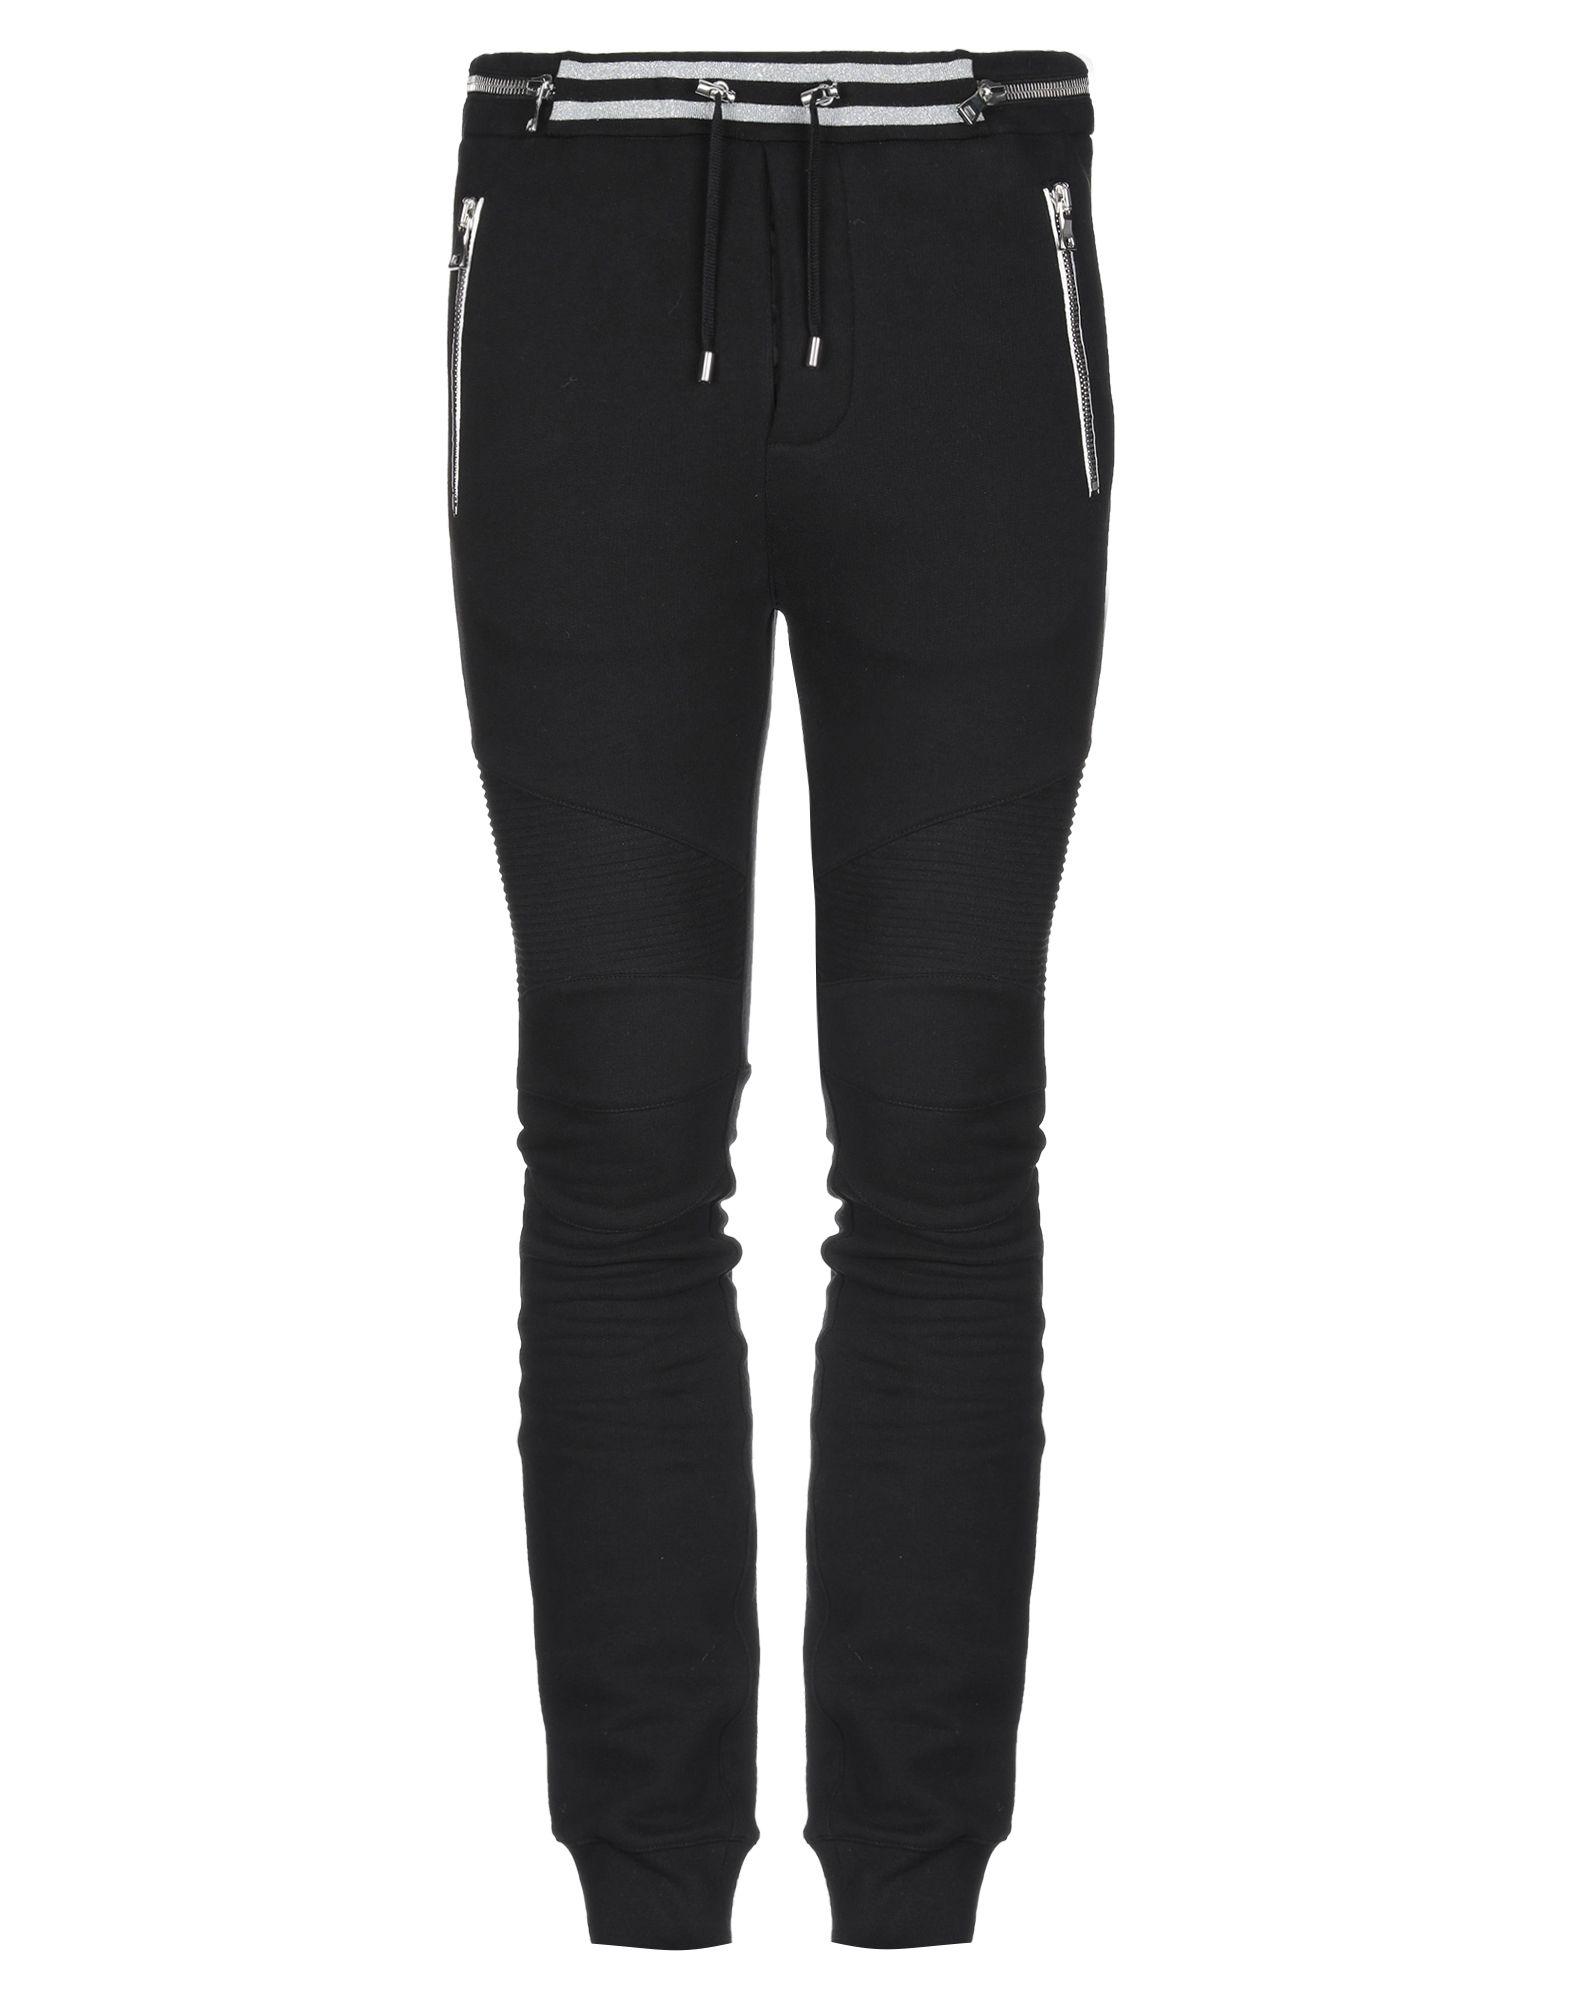 BALMAIN Casual pants. sweatshirt fleece, metal applications, solid color, high waisted, comfort fit, tapered leg, drawstring closure, multipockets, pocket with zipper, fleece lining. 100% Cotton